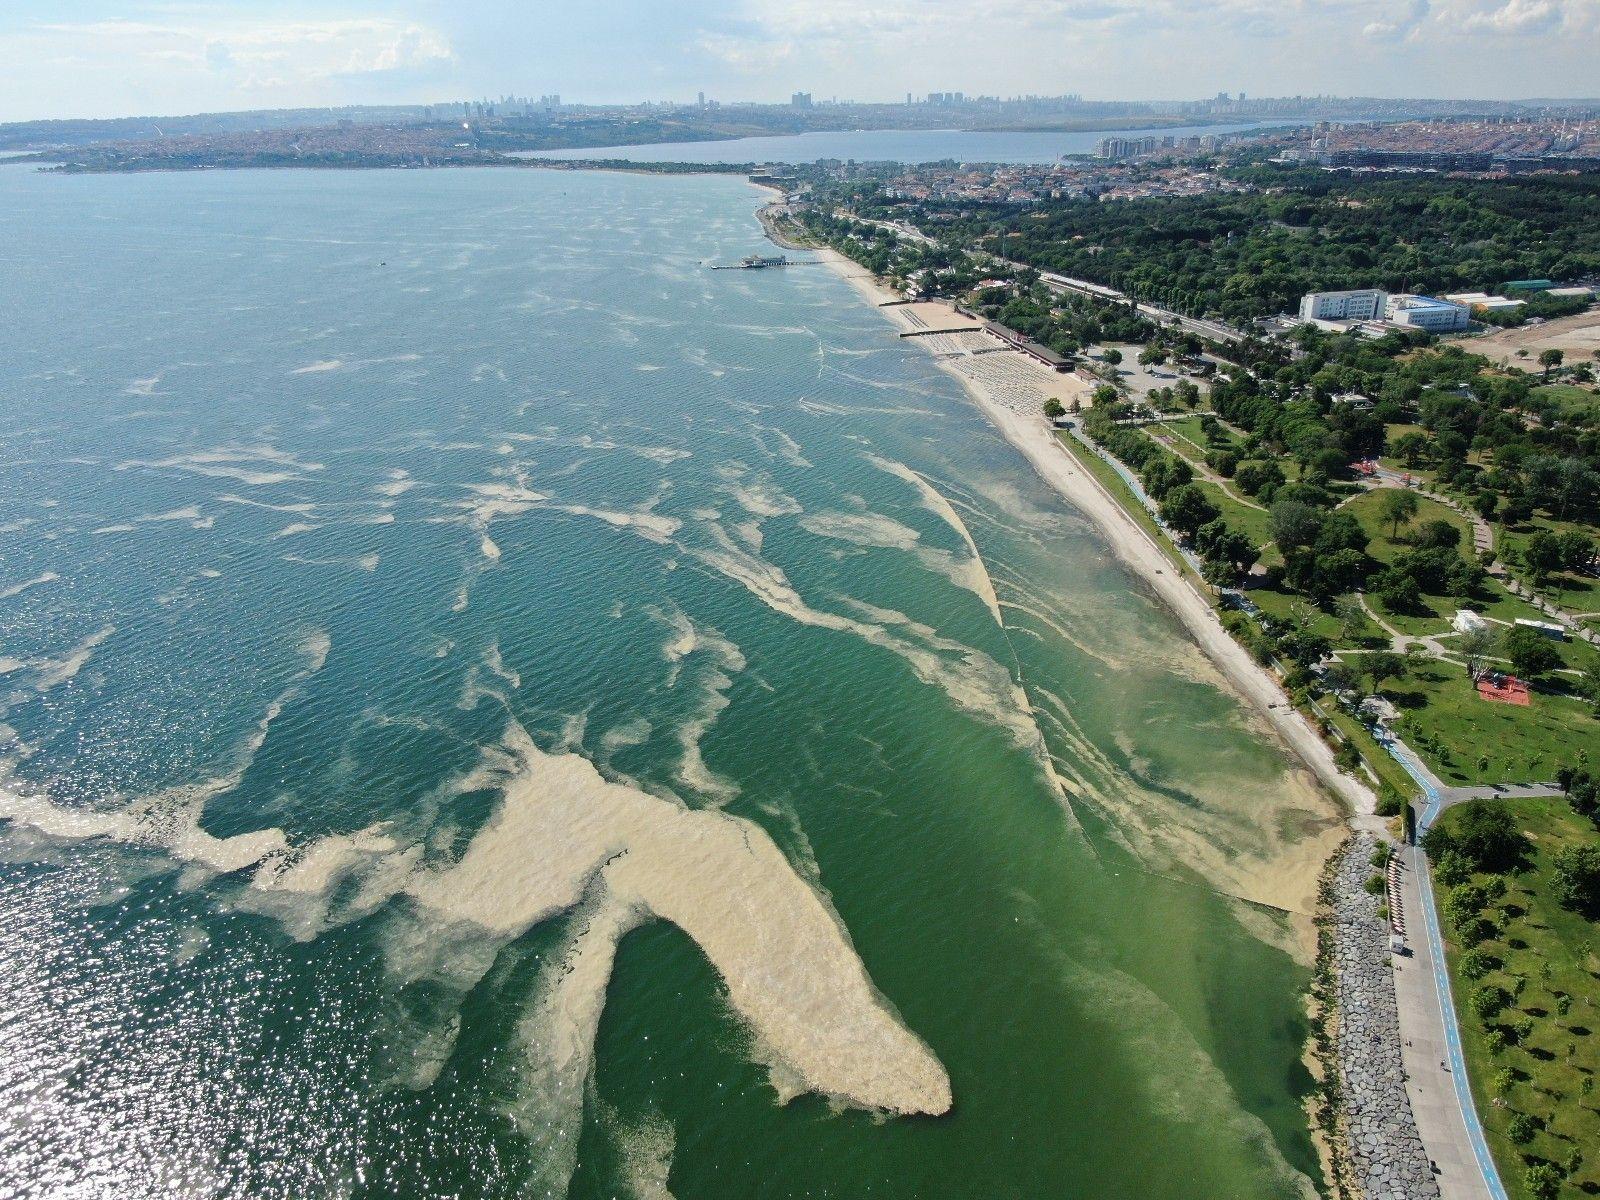 2021/06/deniz-salyasi-bu-kez-bakirkoy-kiyilarini-sardi-20210613AW34-1.jpg